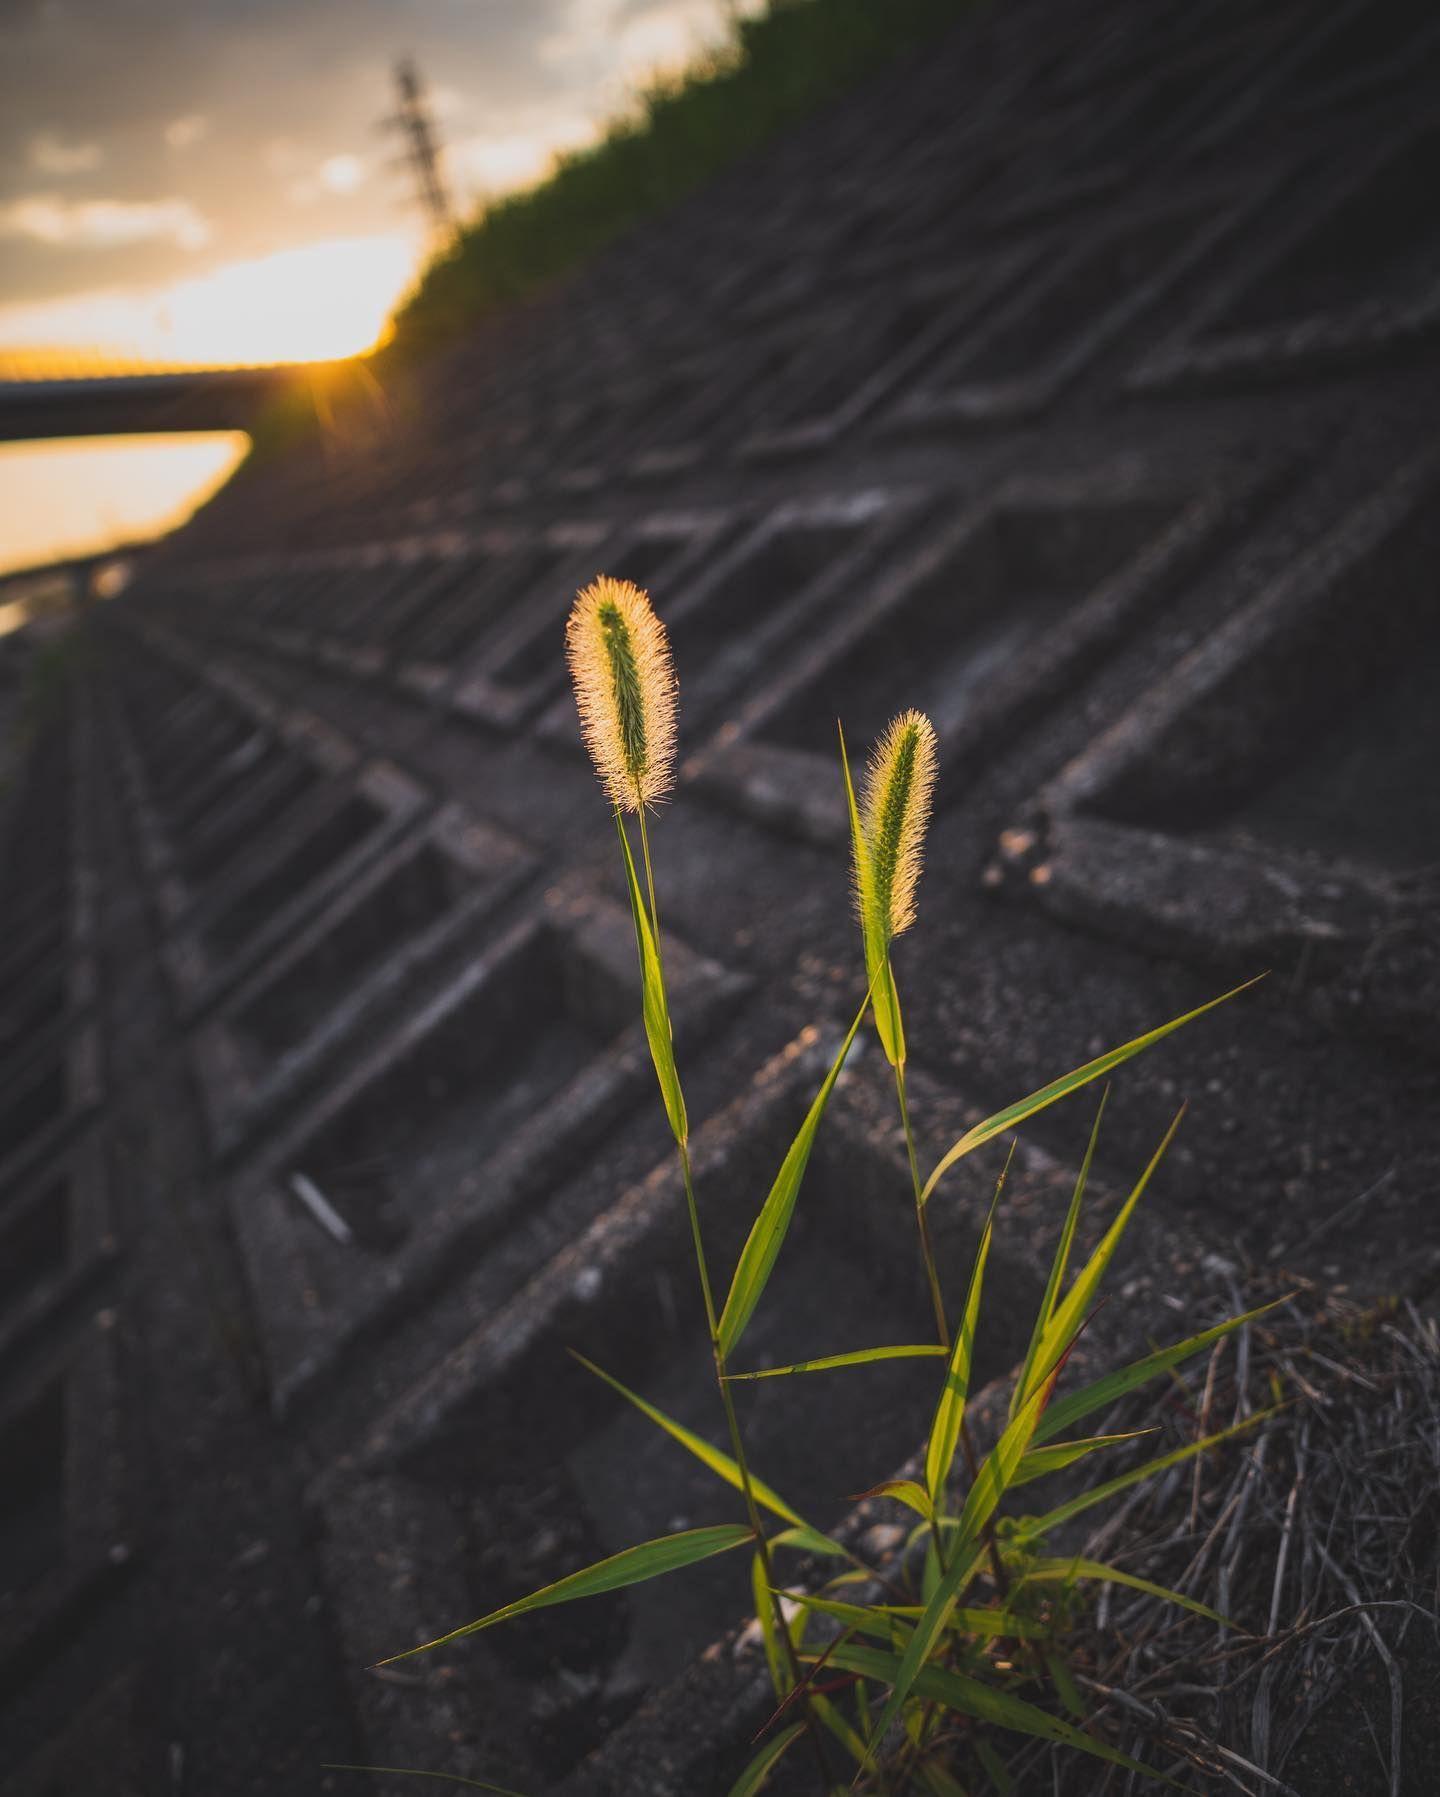 Sunset  #onichie #osaka #japan #osakajapan #大阪 #日本 #オニッチ #おにっち #fromosaka #fromjapan #omg #onichiemusicgarage #ツァイスBatisで撮りたい #aestheticsjapan #shotonlexar #ricoh #ricohgr #gr3 #griii #リコーGR #リコーGR3 #sunset #sky #夕陽 #夕焼け